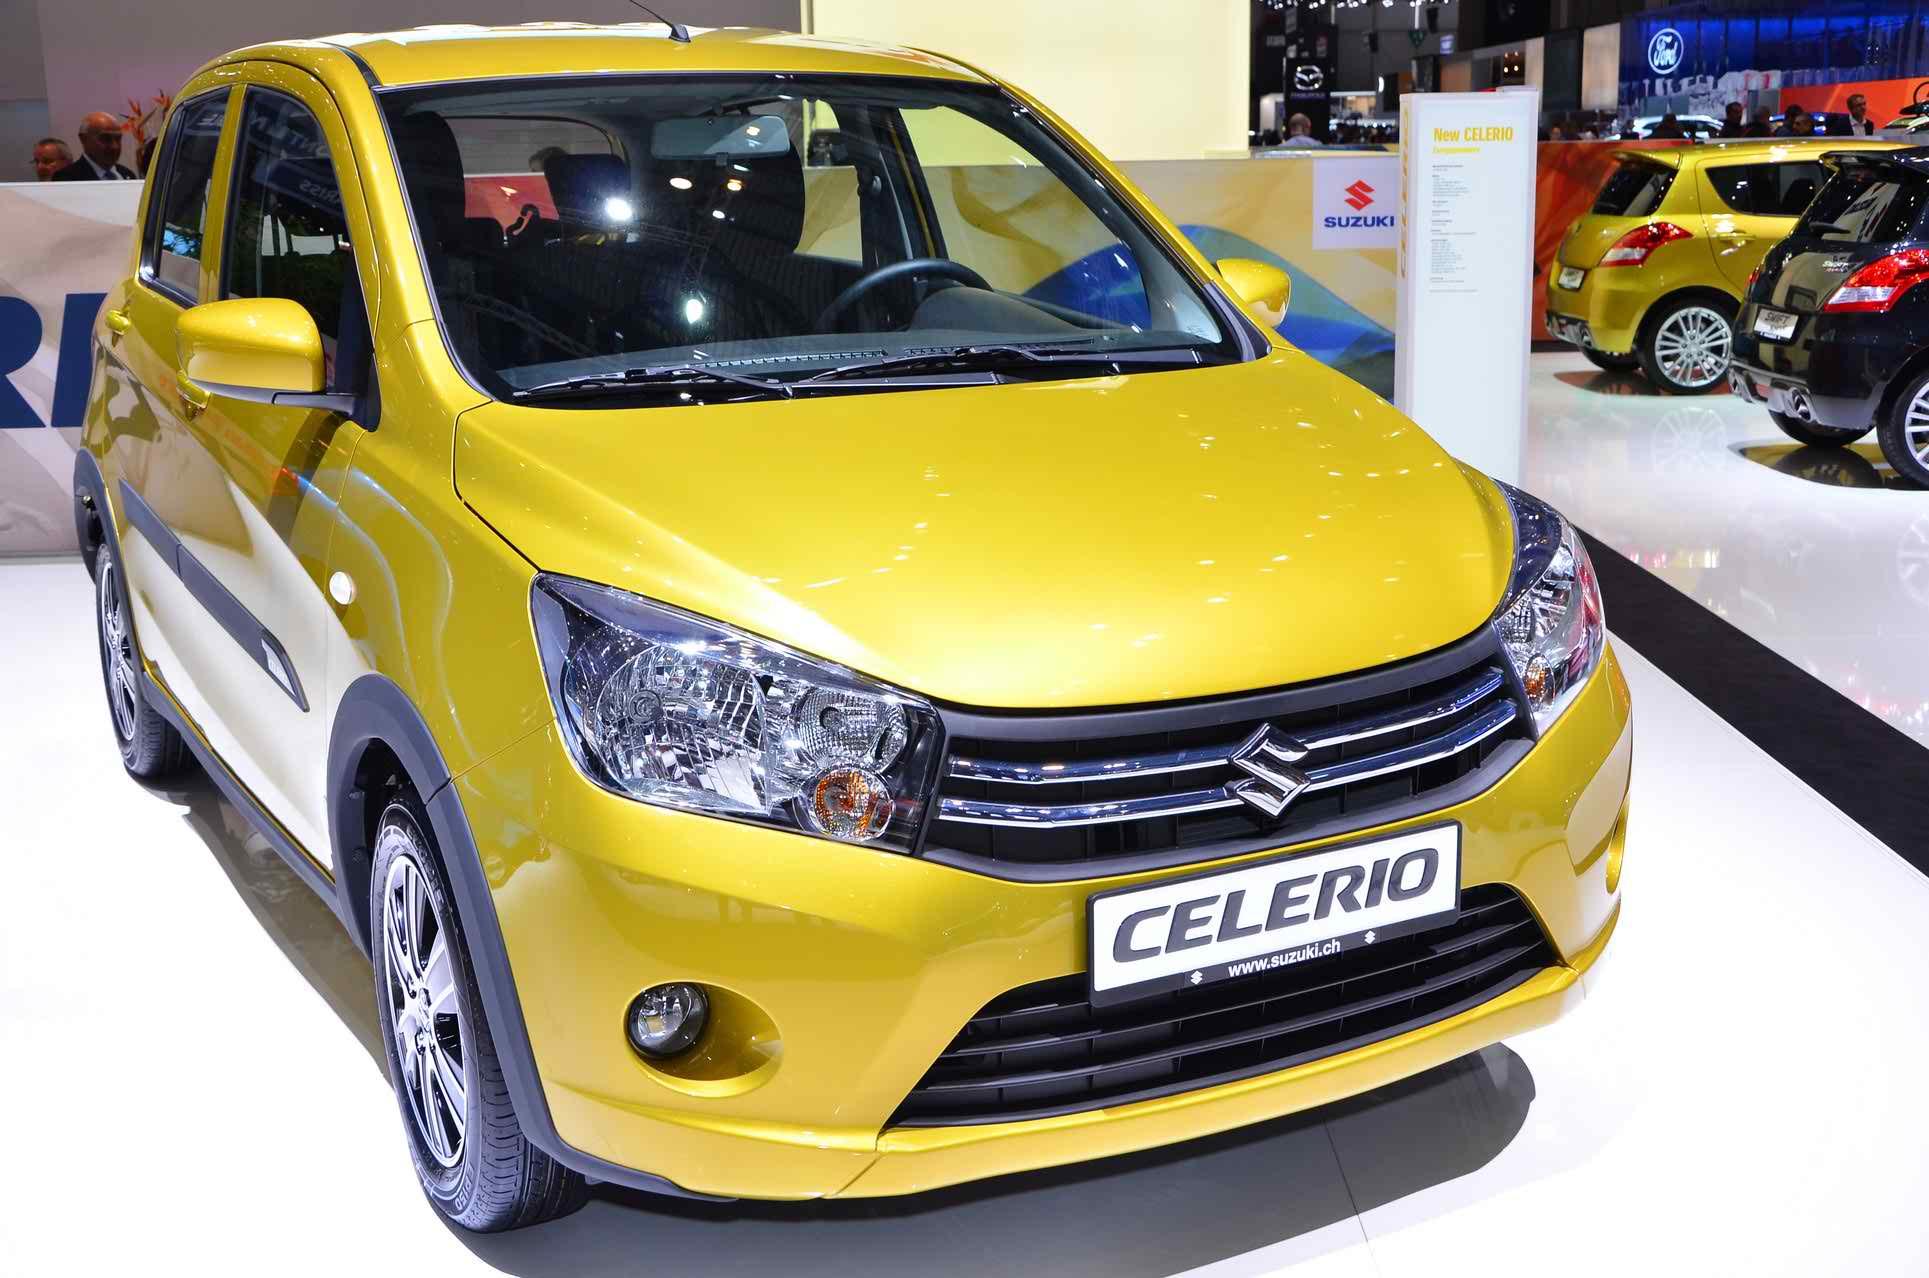 Suzuki-Celerio-Pakistan-2016-Launch-Date-Price-Fuel-Consumption-Specification-Review-New-Model